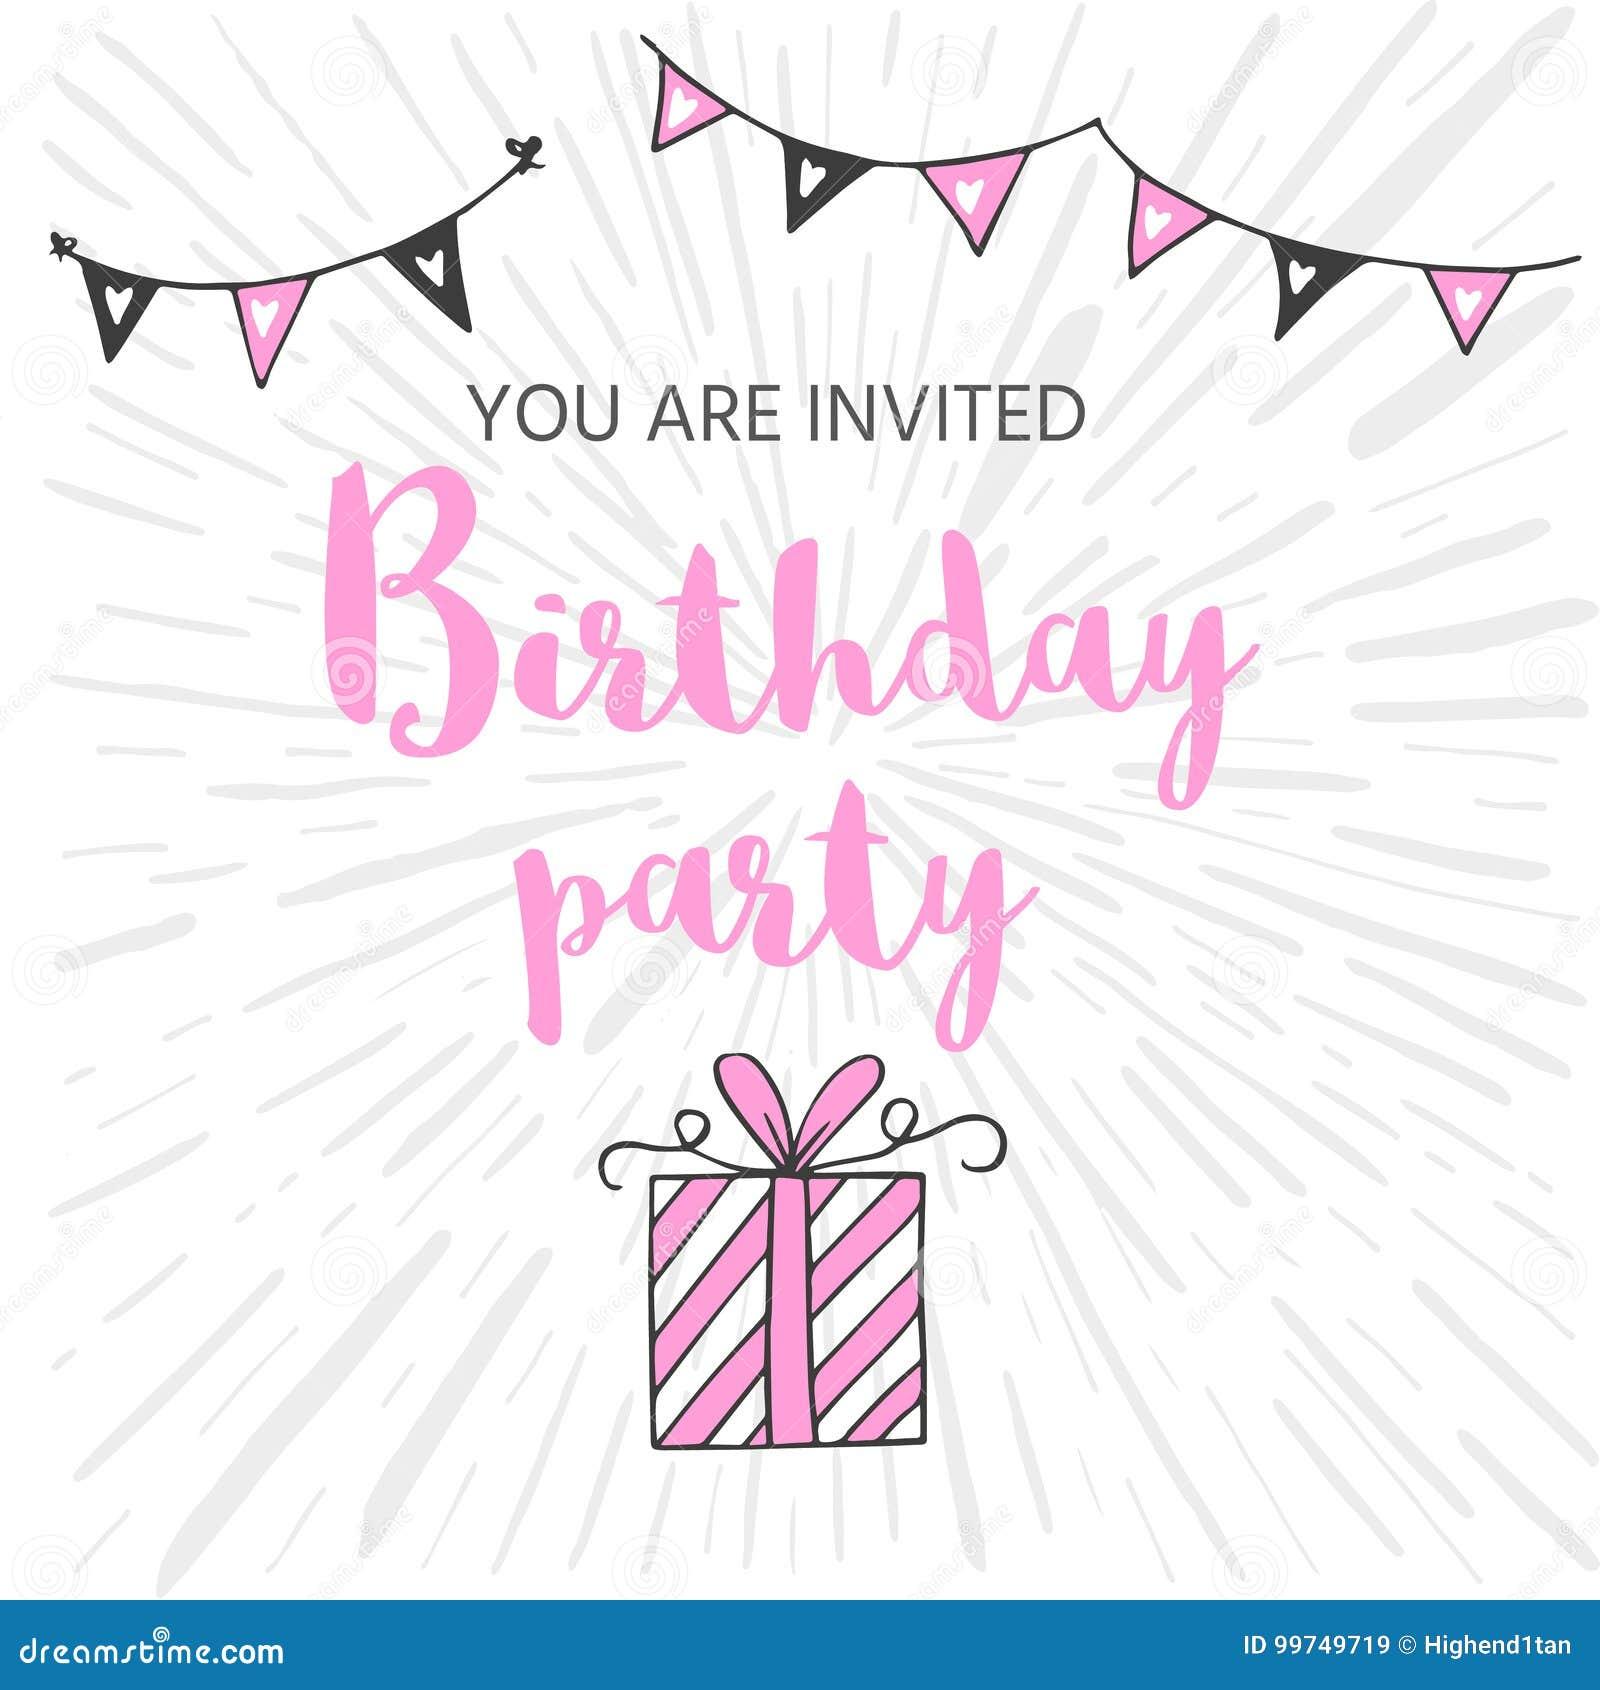 Happy Birthday Greeting Card And Party Invitation Templates Bla